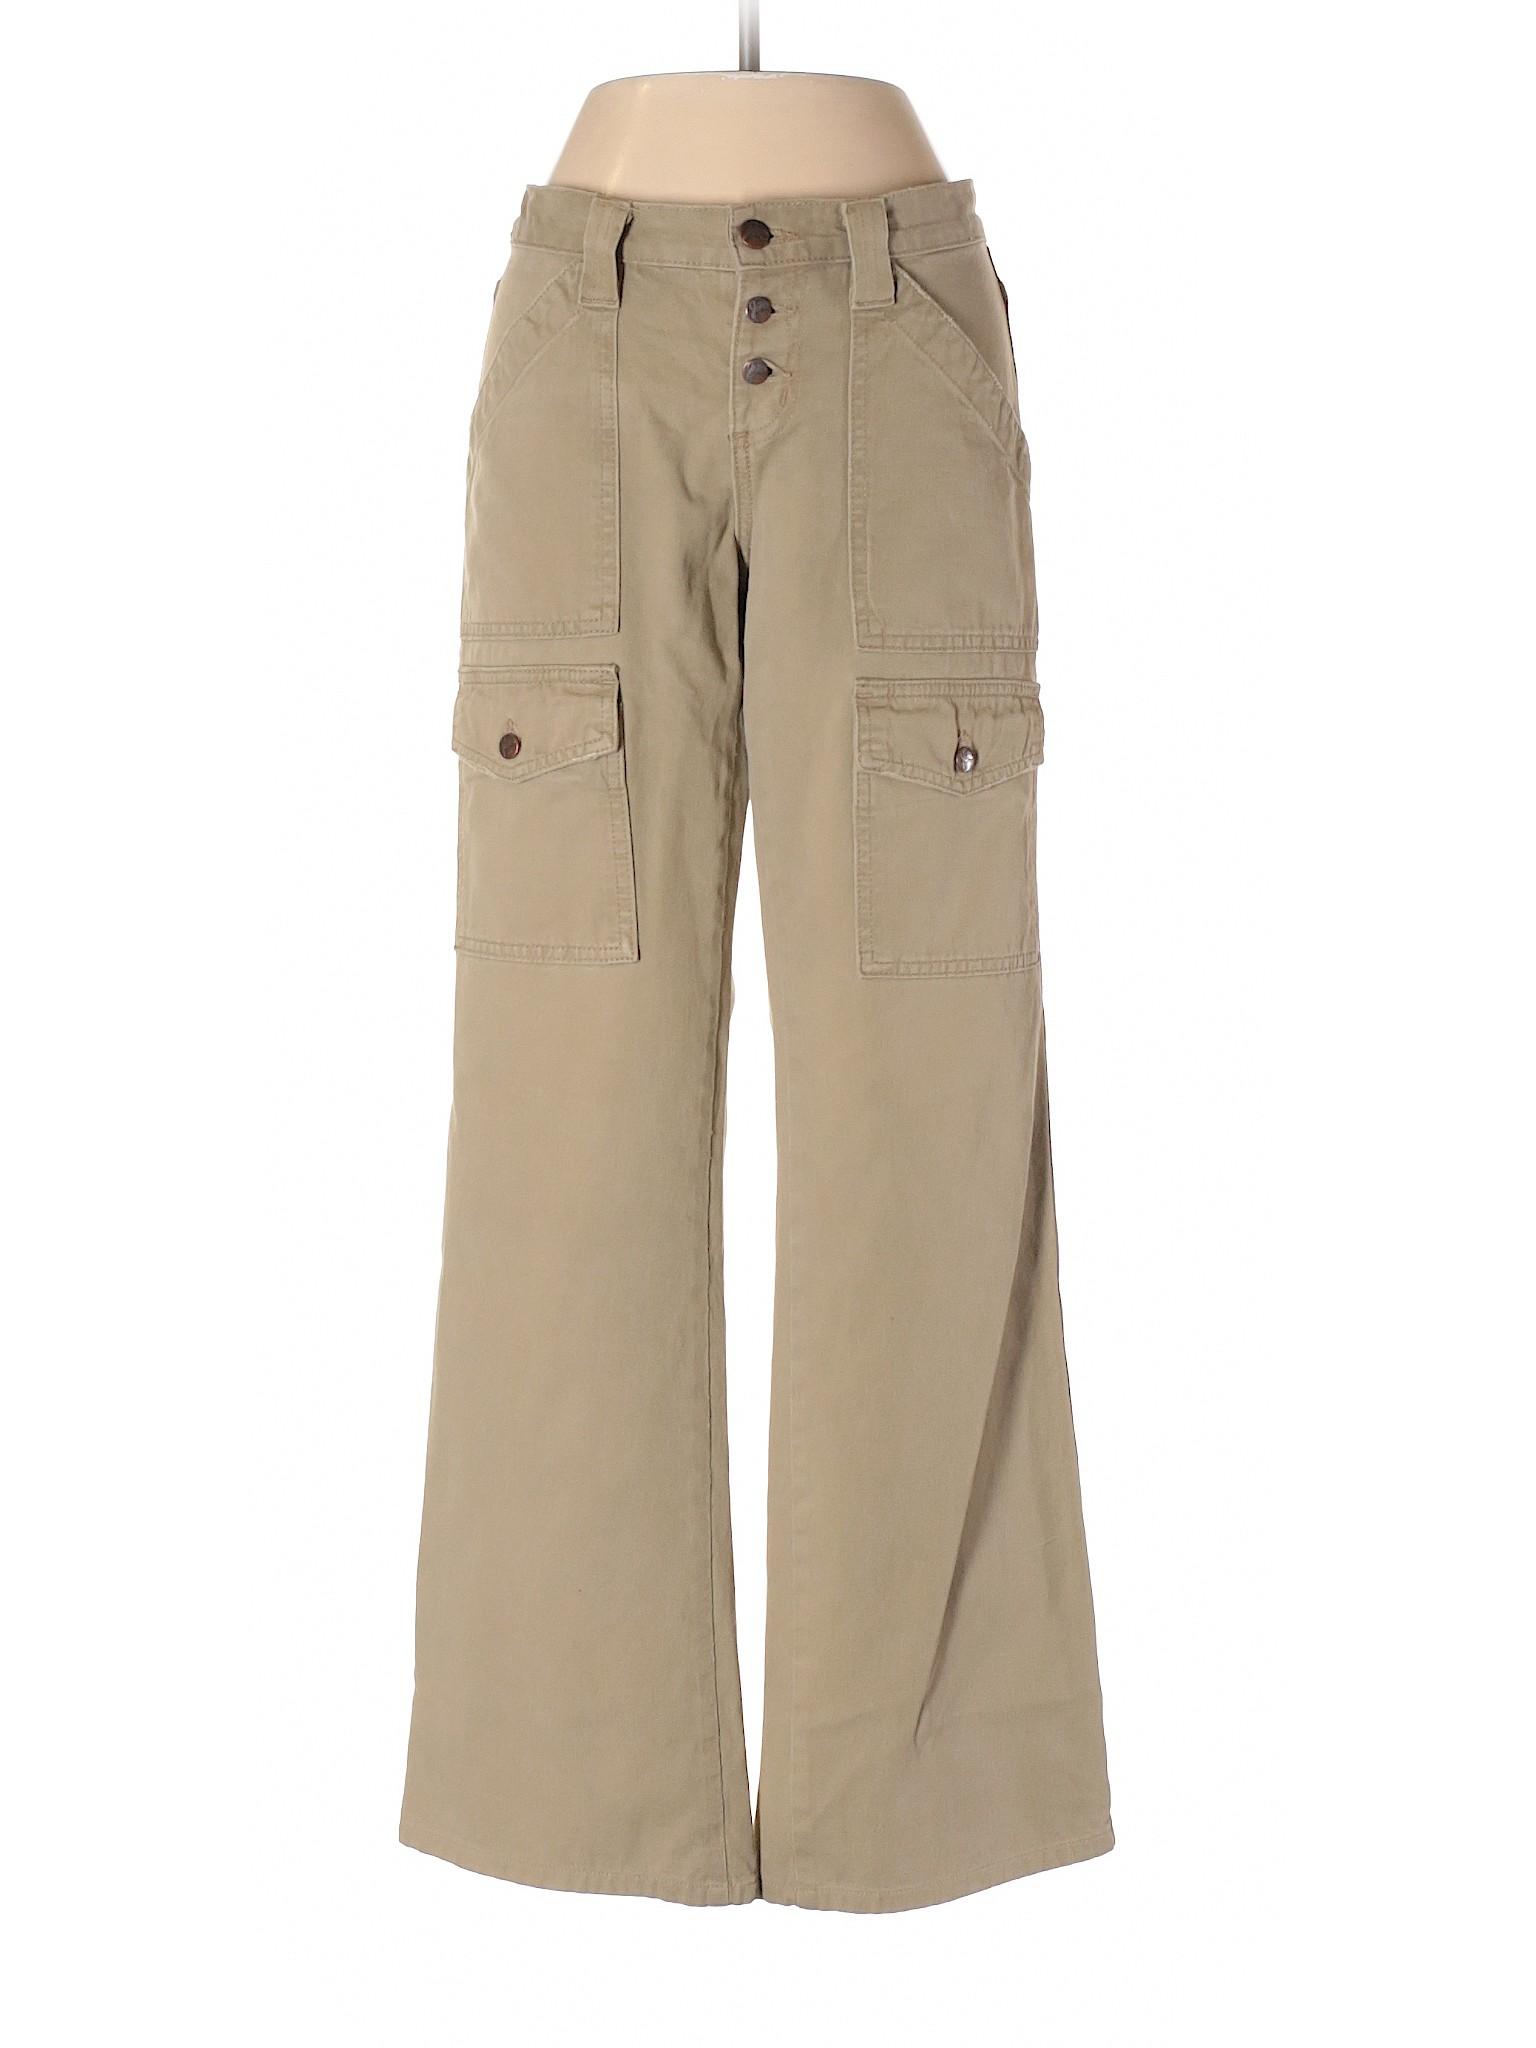 winter Pants Cargo Pants Leisure Cargo Leisure winter Joie Joie Uq5w6Eq